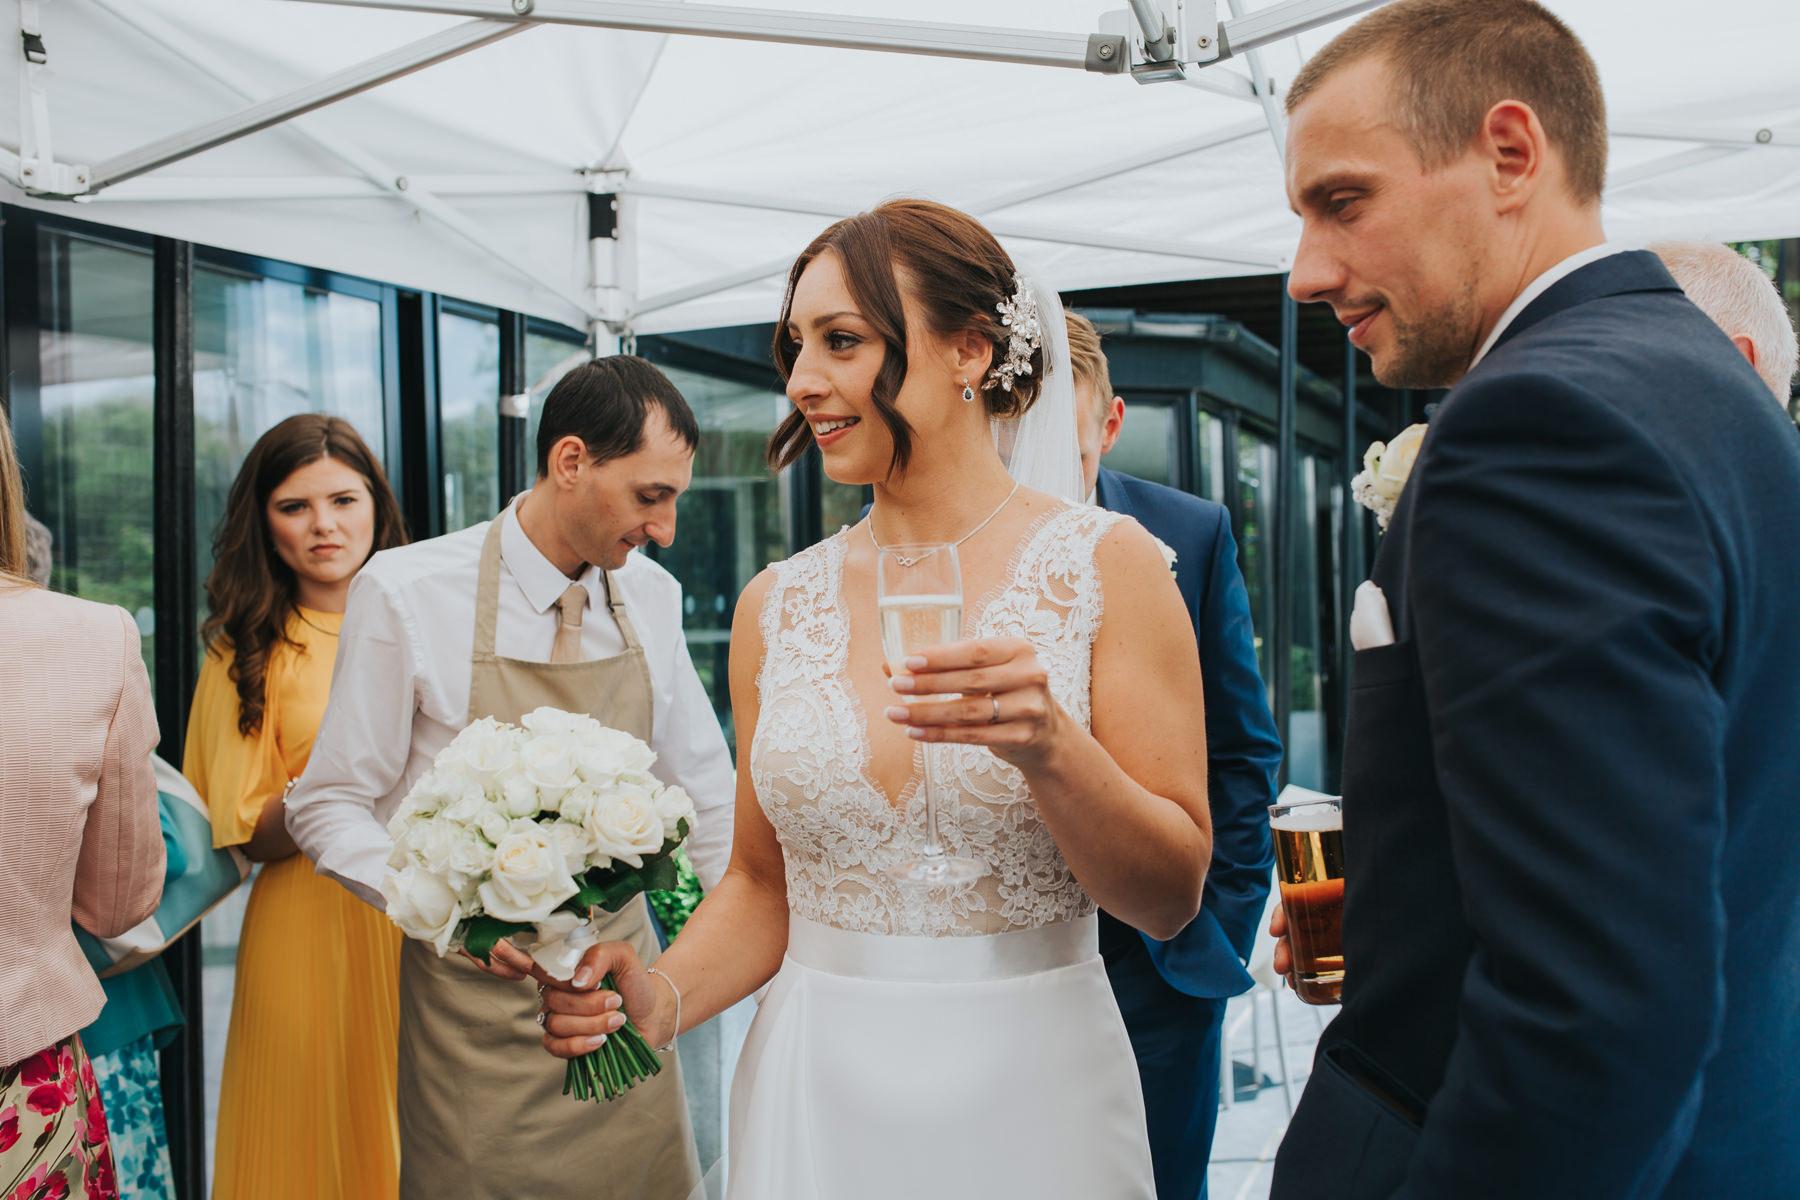 CRL-248-The Bingham wedding Richmond-guest candid photography.jpg